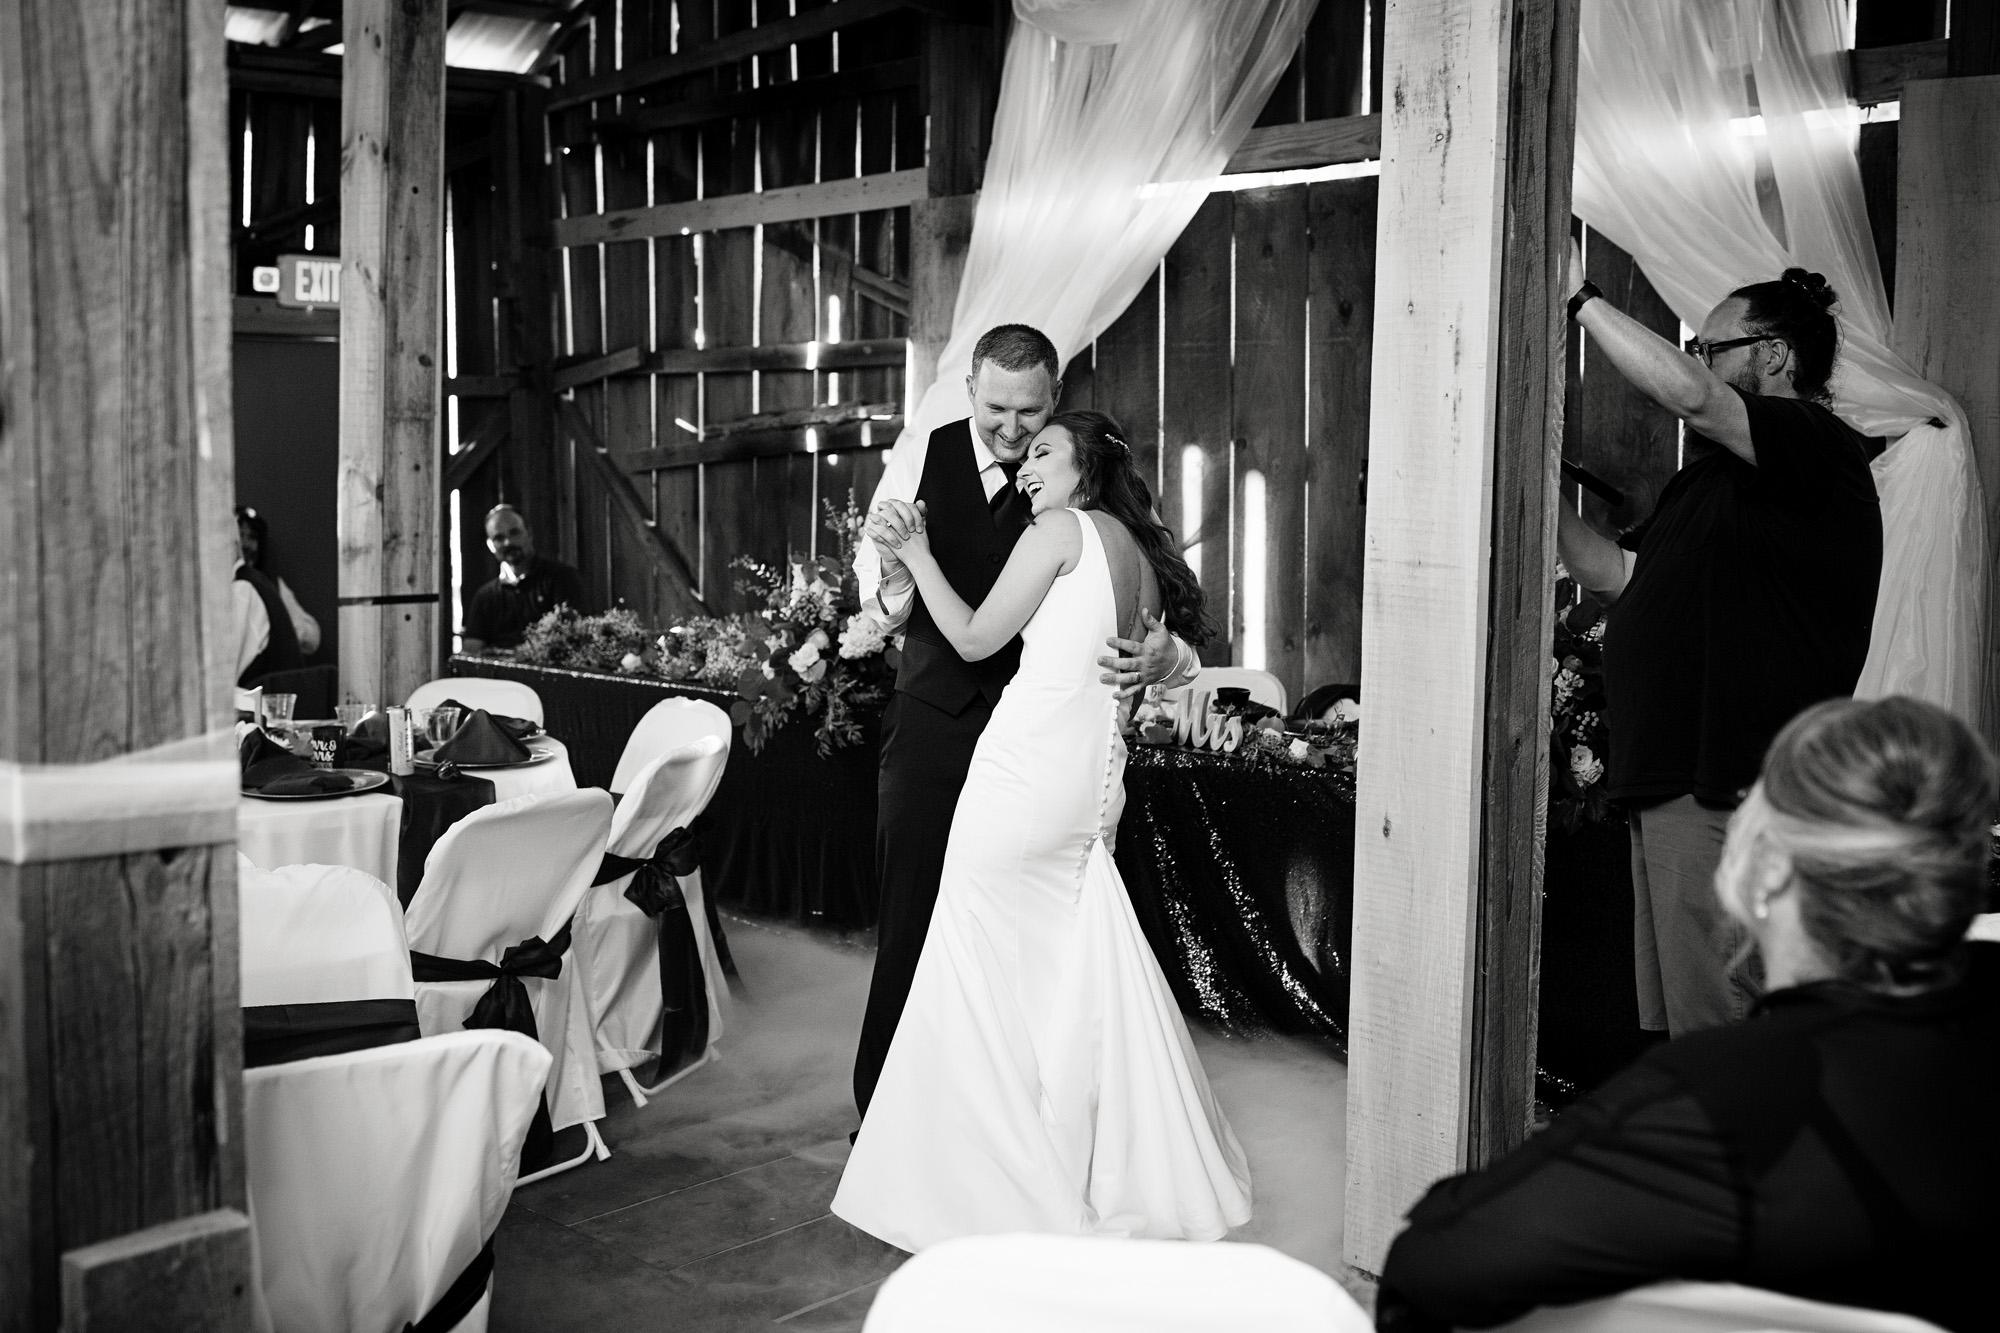 Seriously_Sabrina_Photography_Red_River_Gorge_Wedding_Barn_Robinson101.jpg